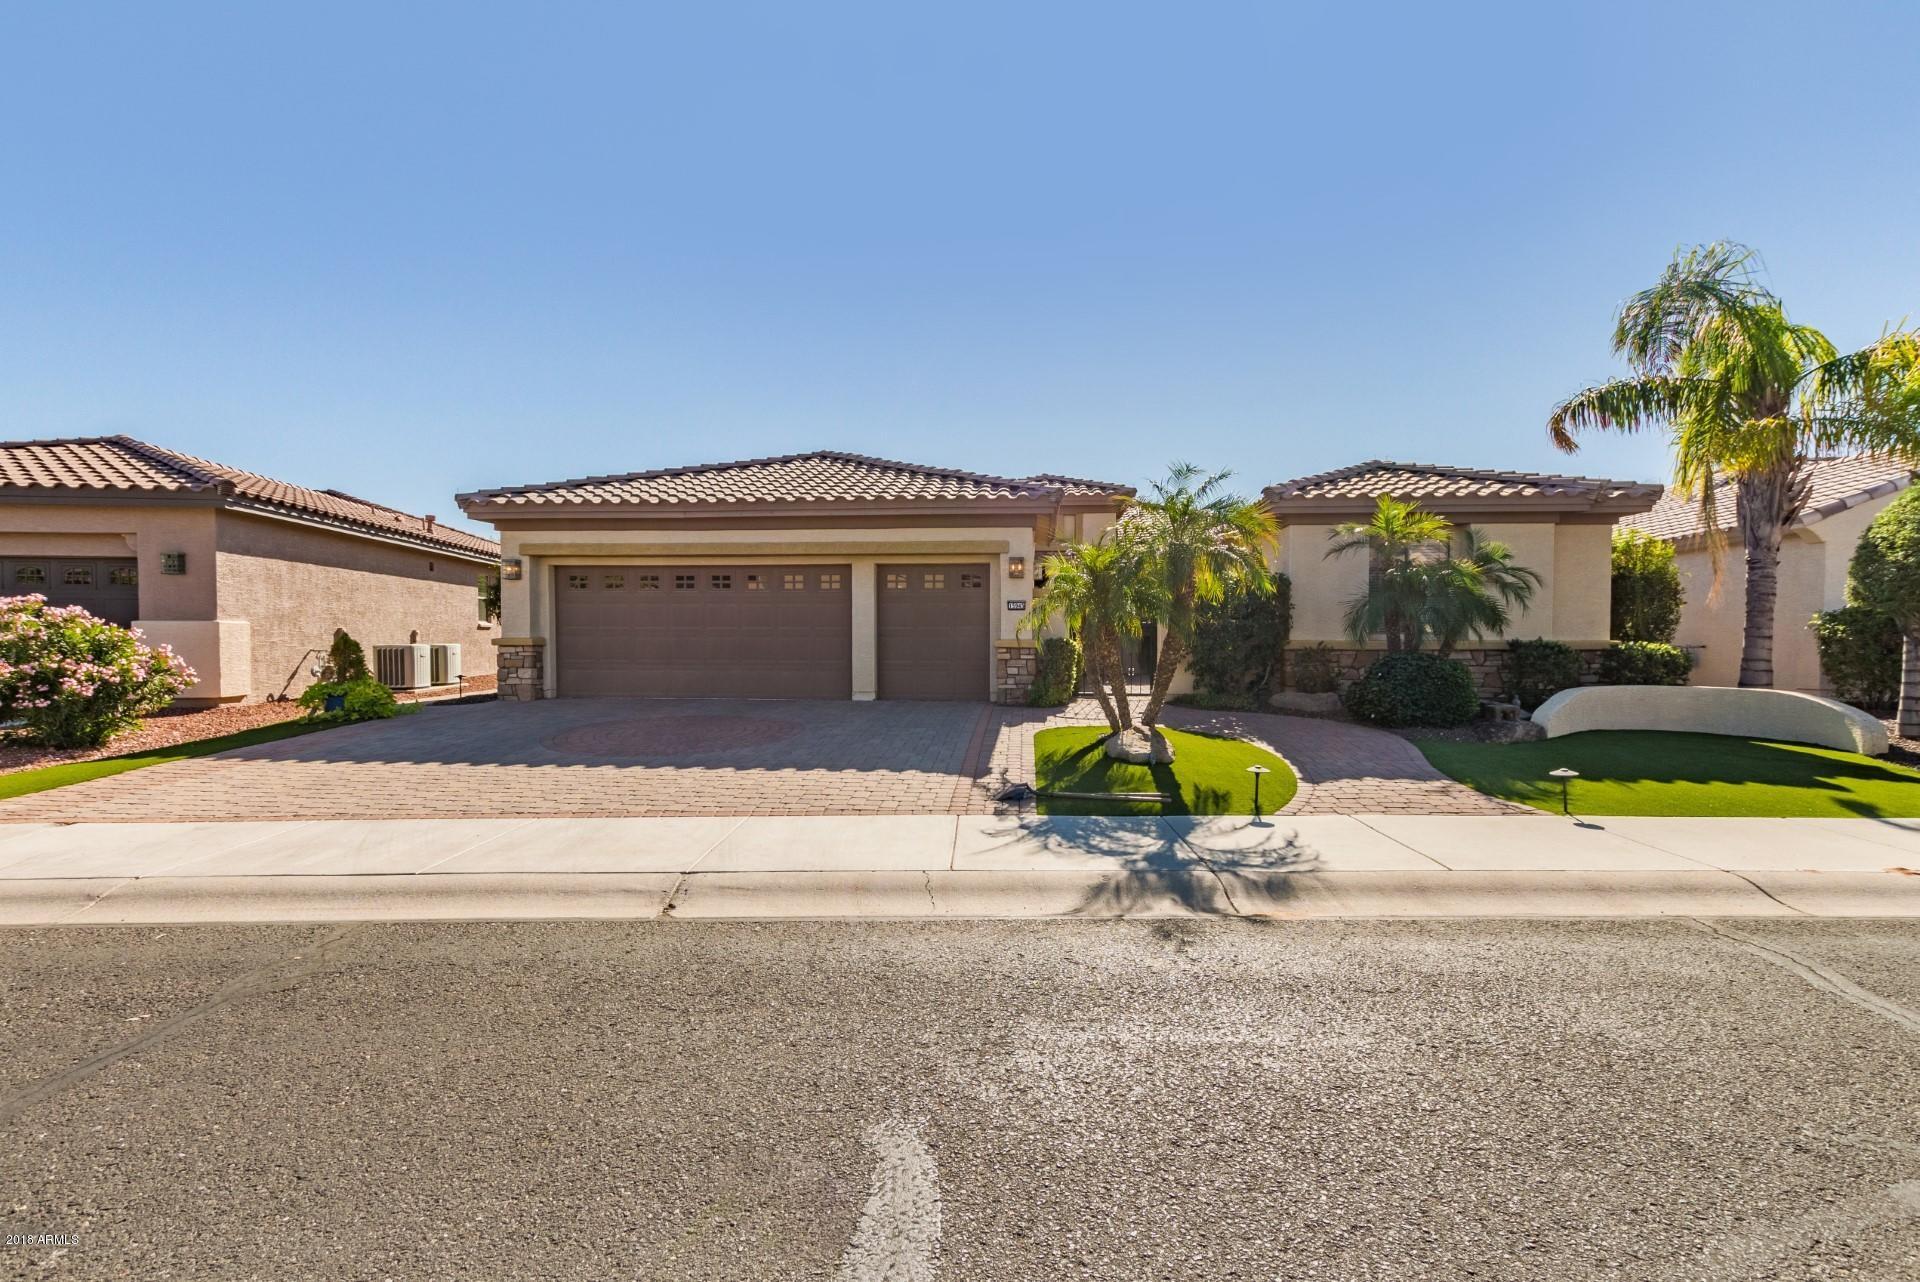 Photo of 15945 W CAMBRIDGE Avenue, Goodyear, AZ 85395